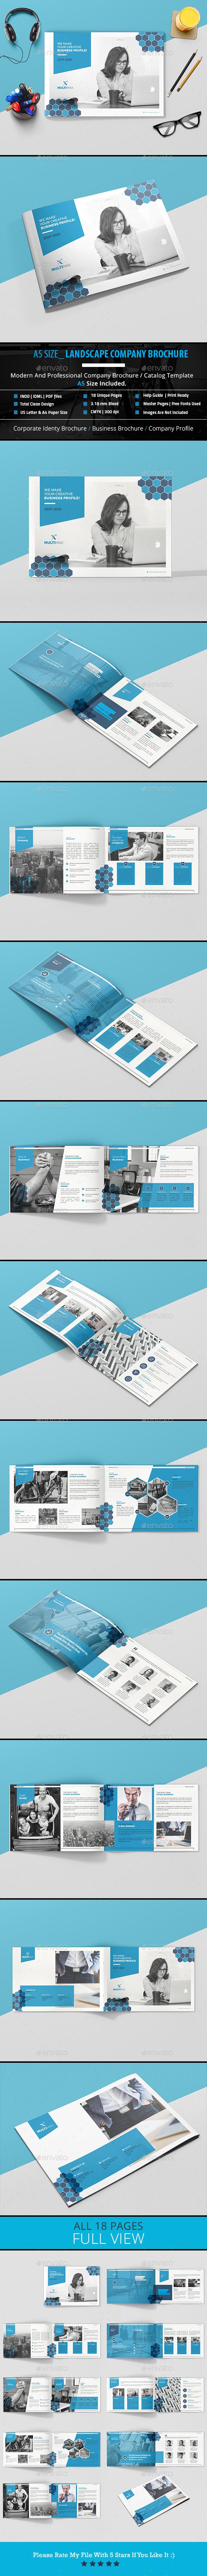 A5 Size_Landscape Brochure - Brochures Print Templates